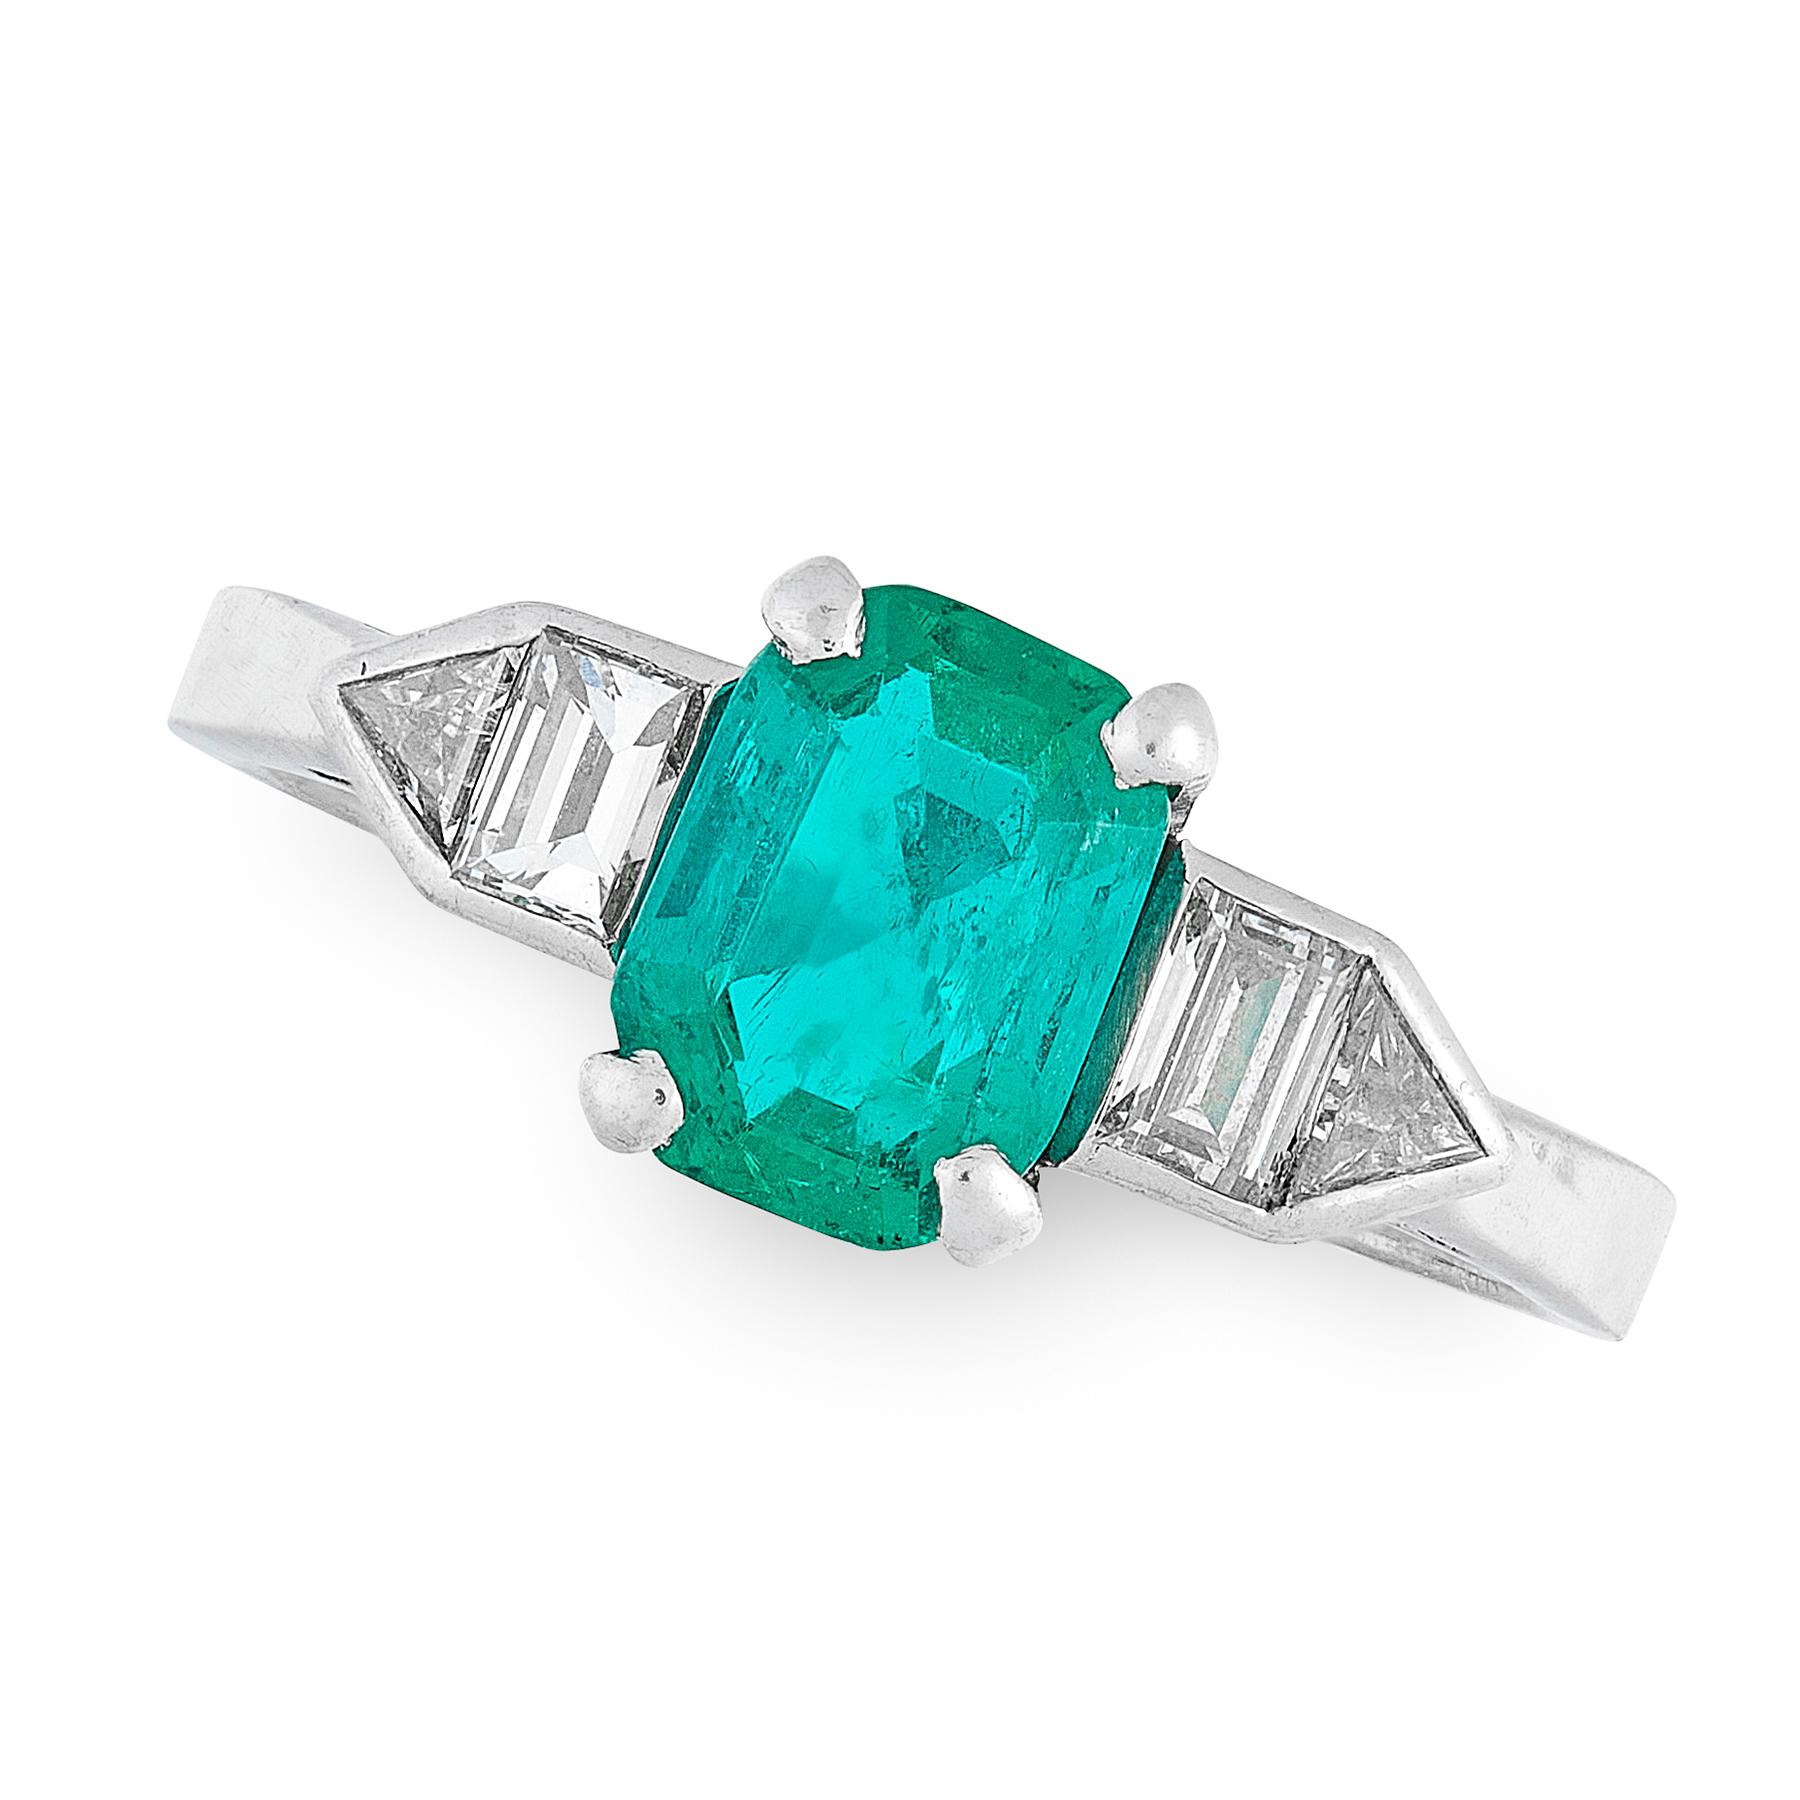 AN EMERALD AND DIAMOND DRESS RING set with an emerald cut emerald of 1.41 carats between geometric